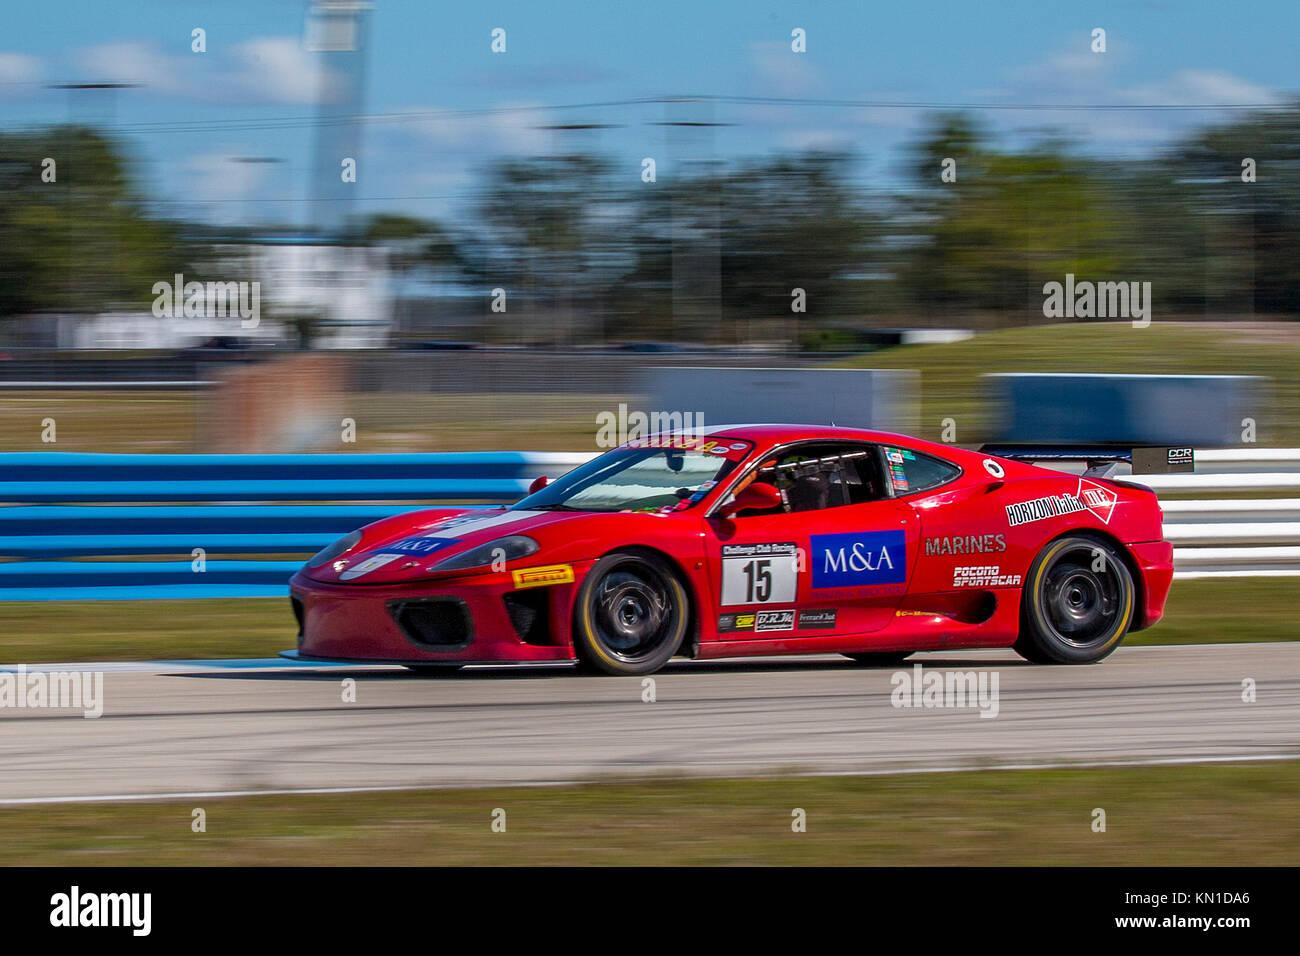 Race car at the Classic 12 Hour & Sebring Historics ; Sebring Historics; ; at Sebring International Raceway - Stock Image